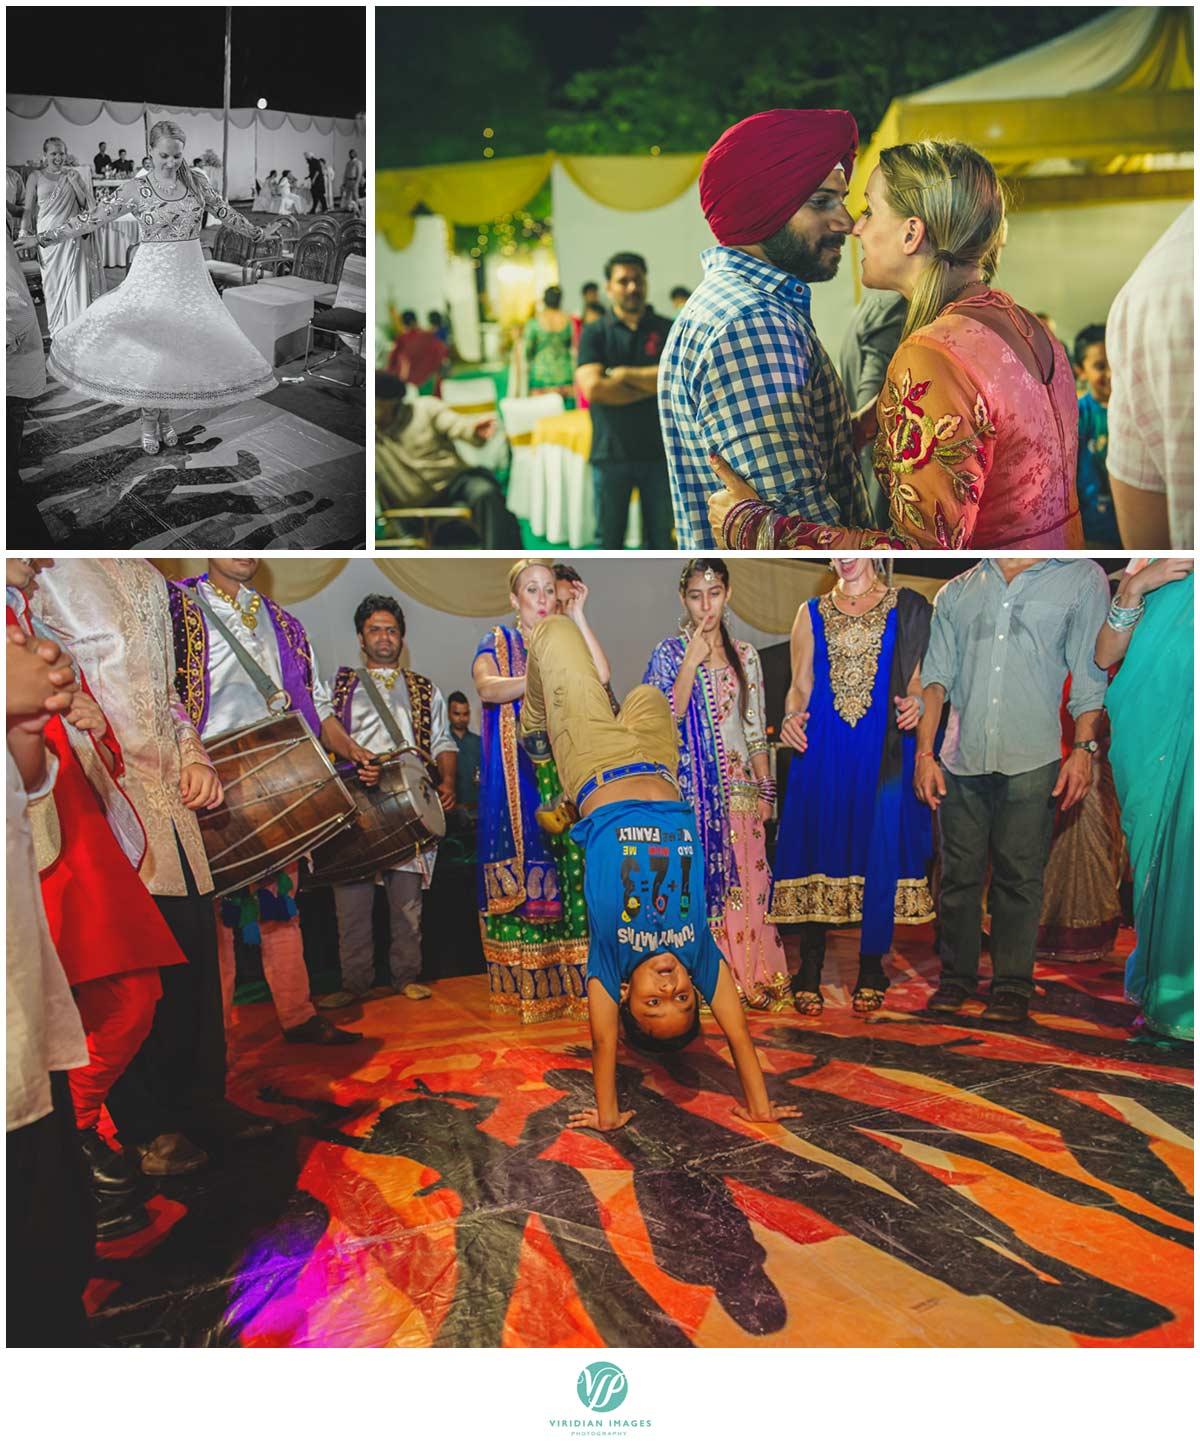 India_Chandigarh_Sangeet_Viridian_Images_Photography_poto_12